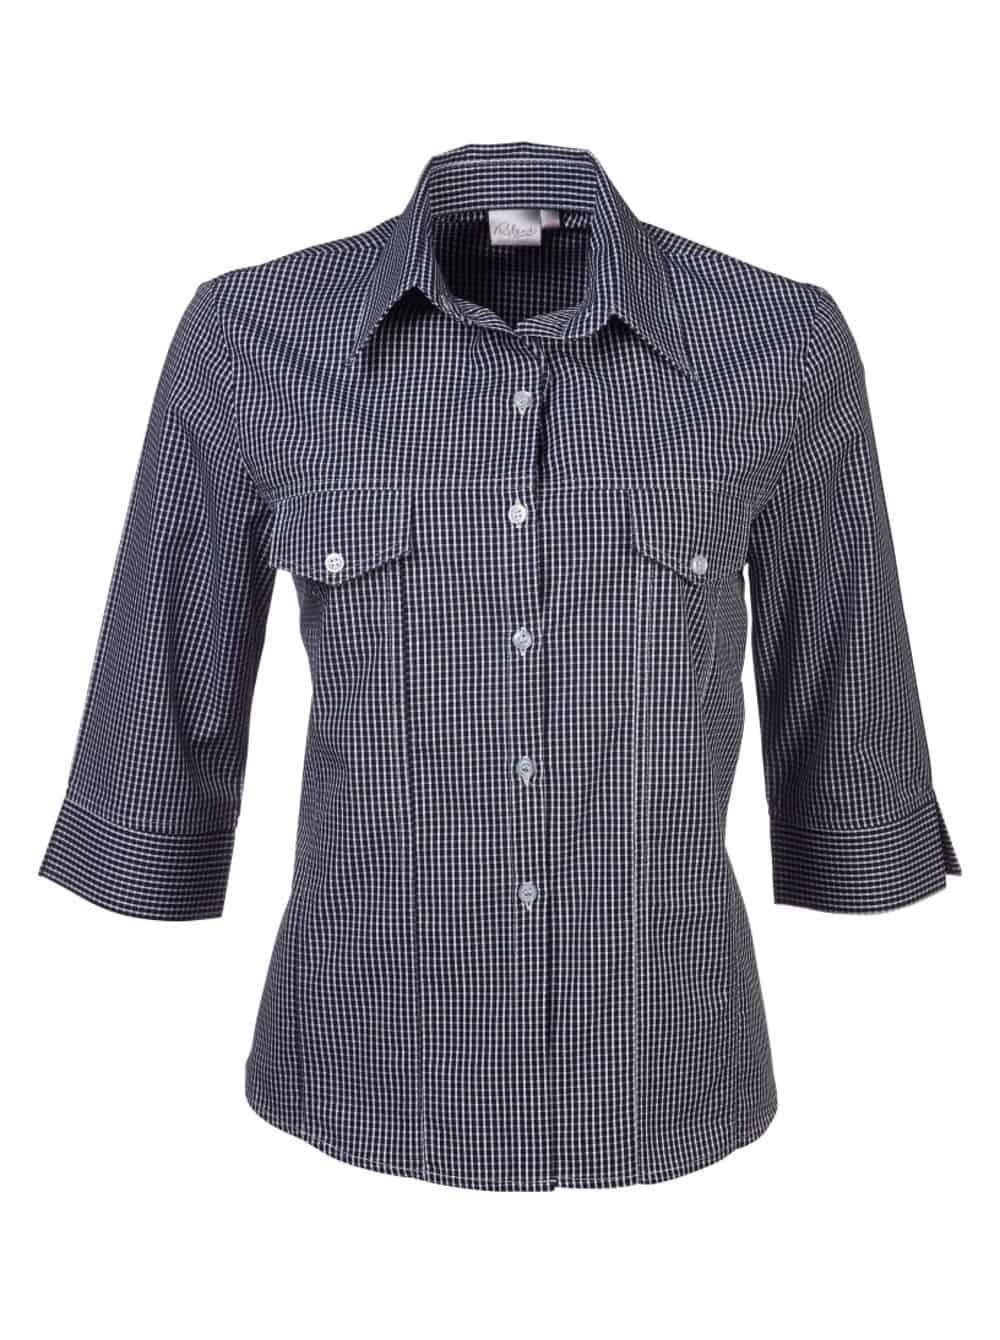 3/4 B12 Janine Blouse Lounge Shirts and Blouses